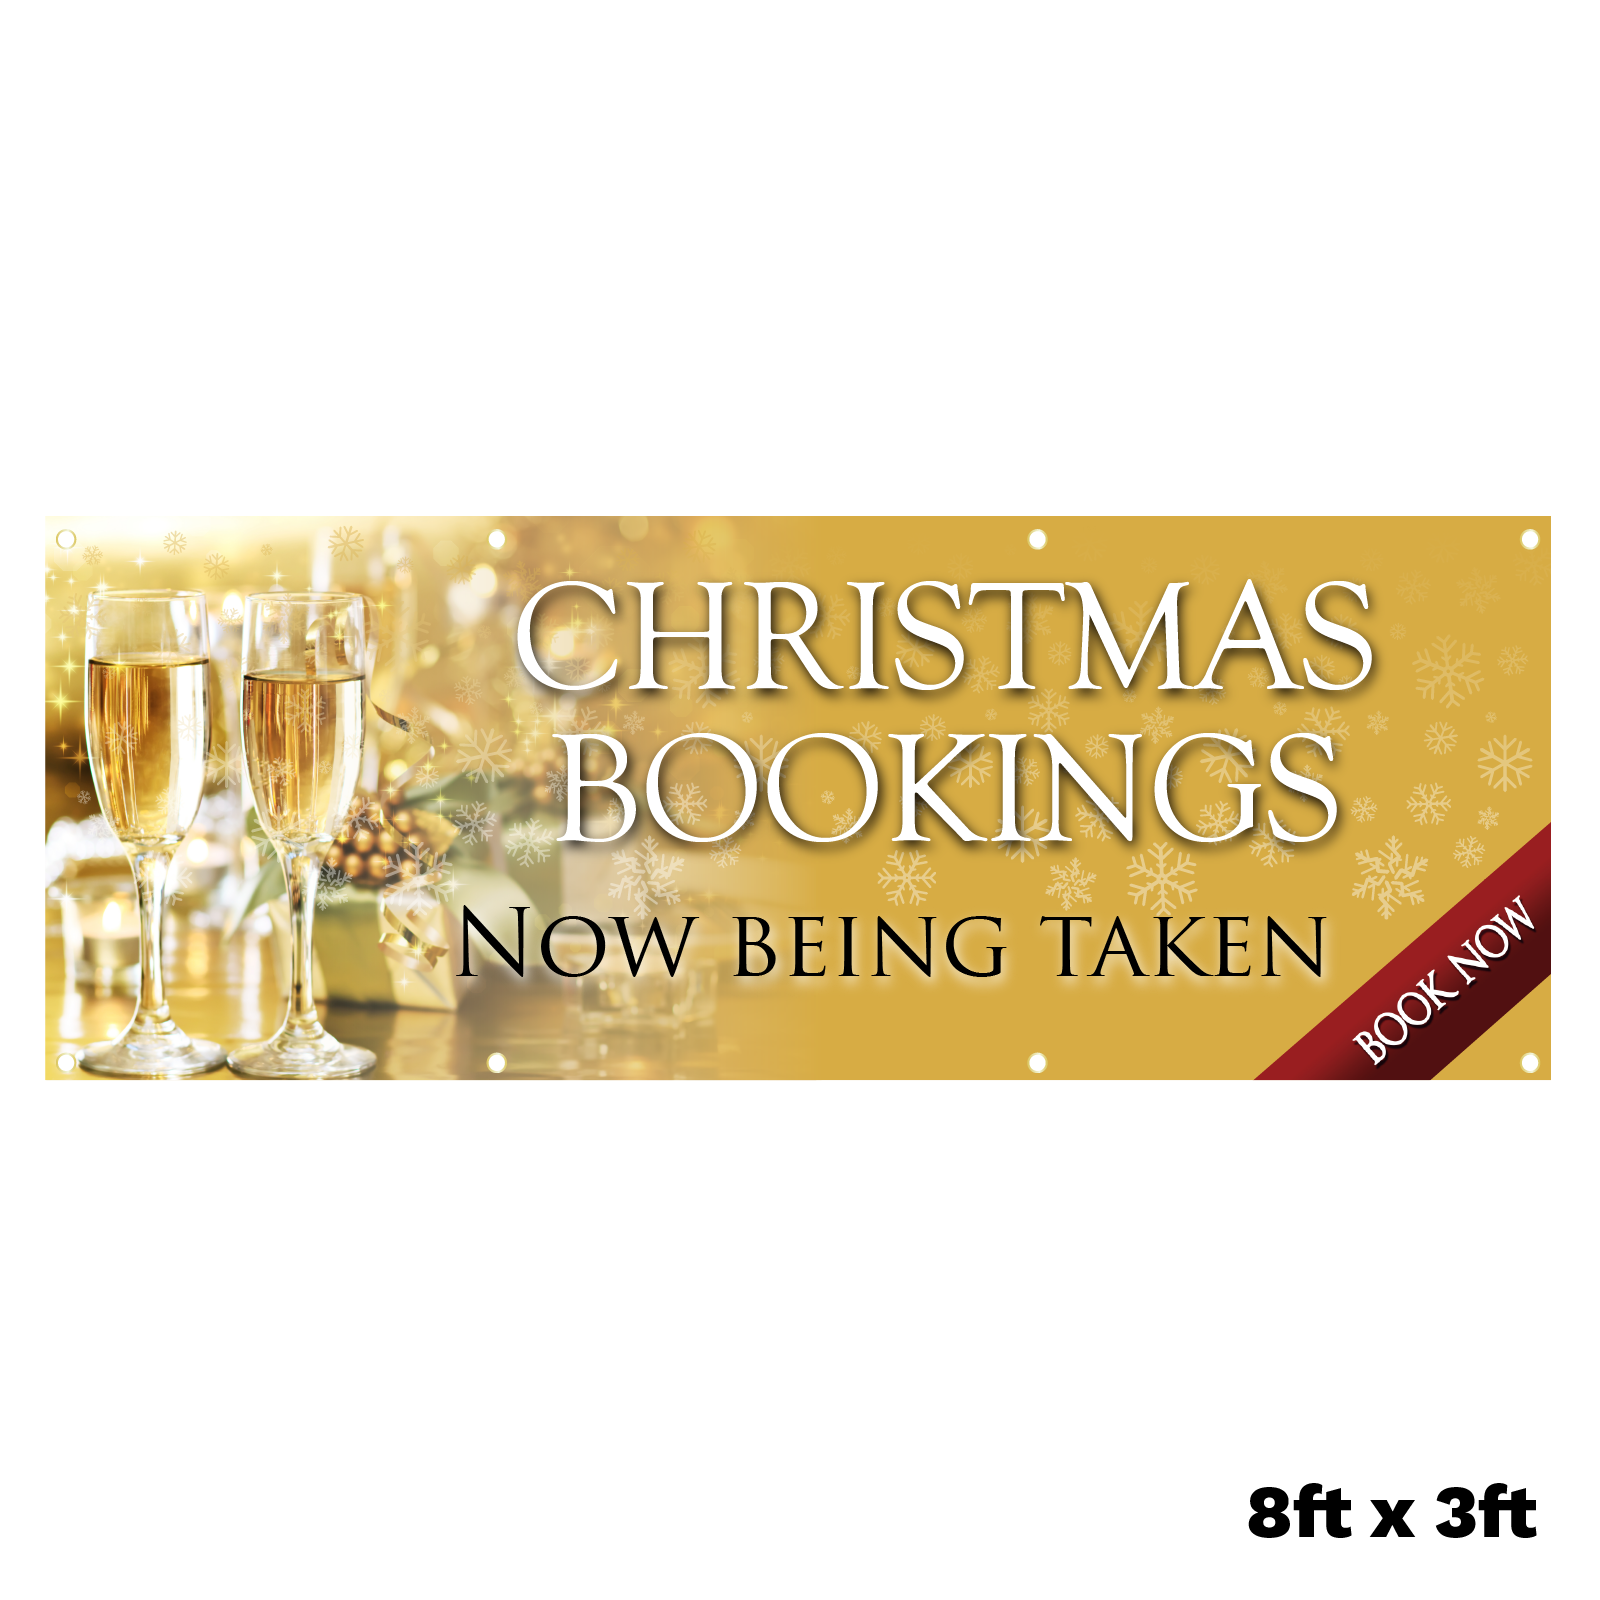 Advertising for Christmas